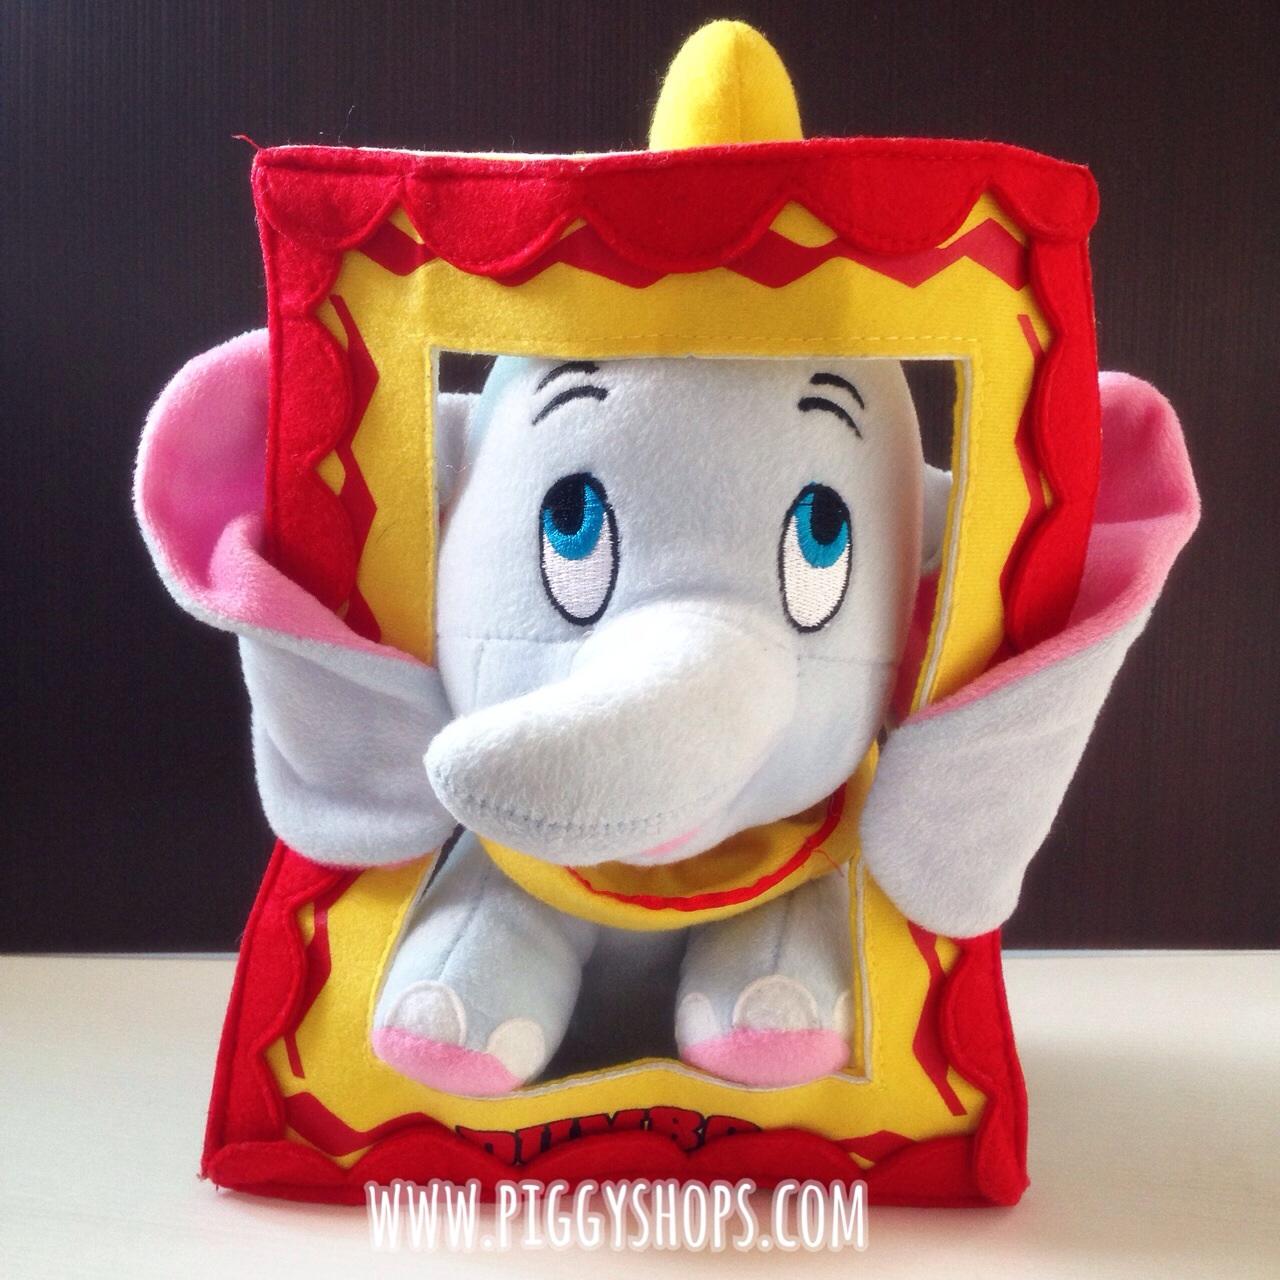 Disney elephant Dumbo in frame ตุ๊กตาดัมโบ้ ช้างน้อยมหัศจรรย์